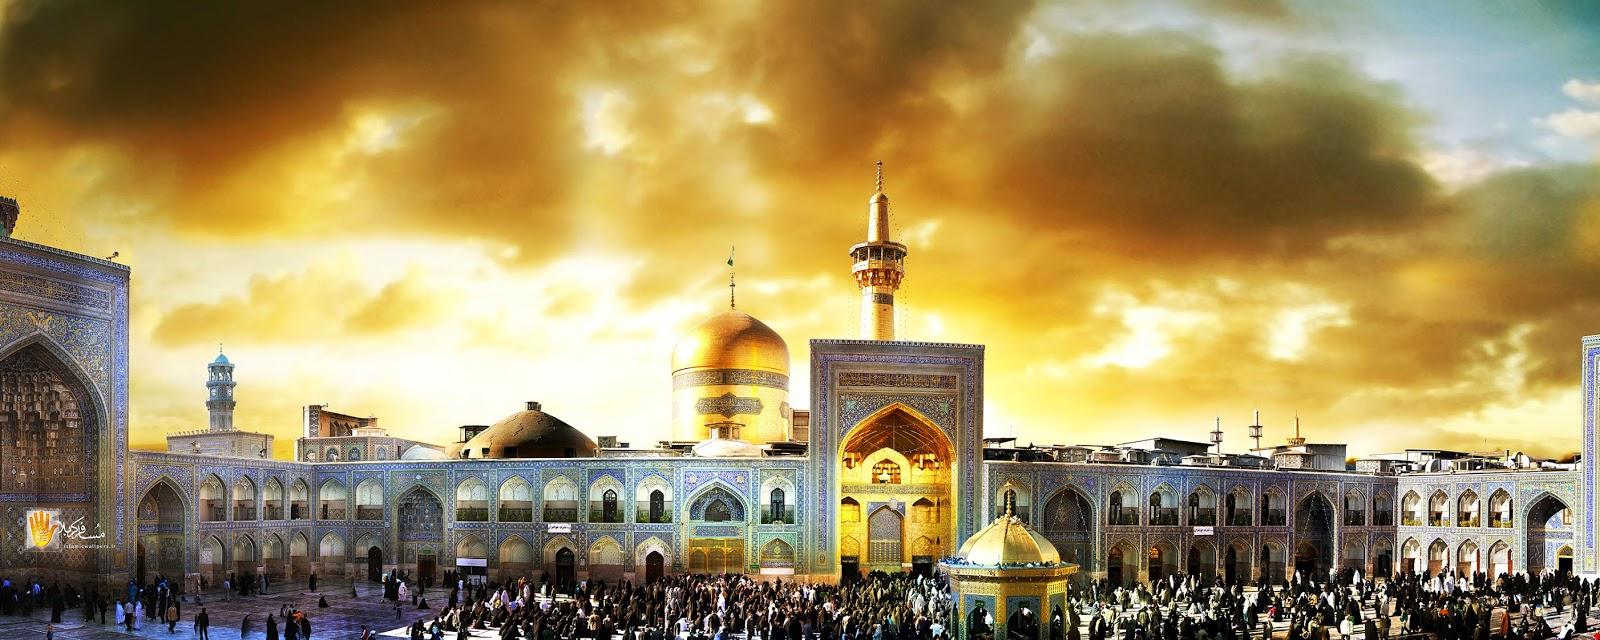 Muslim convert experiences Imam Reza shrine - International Shia ...